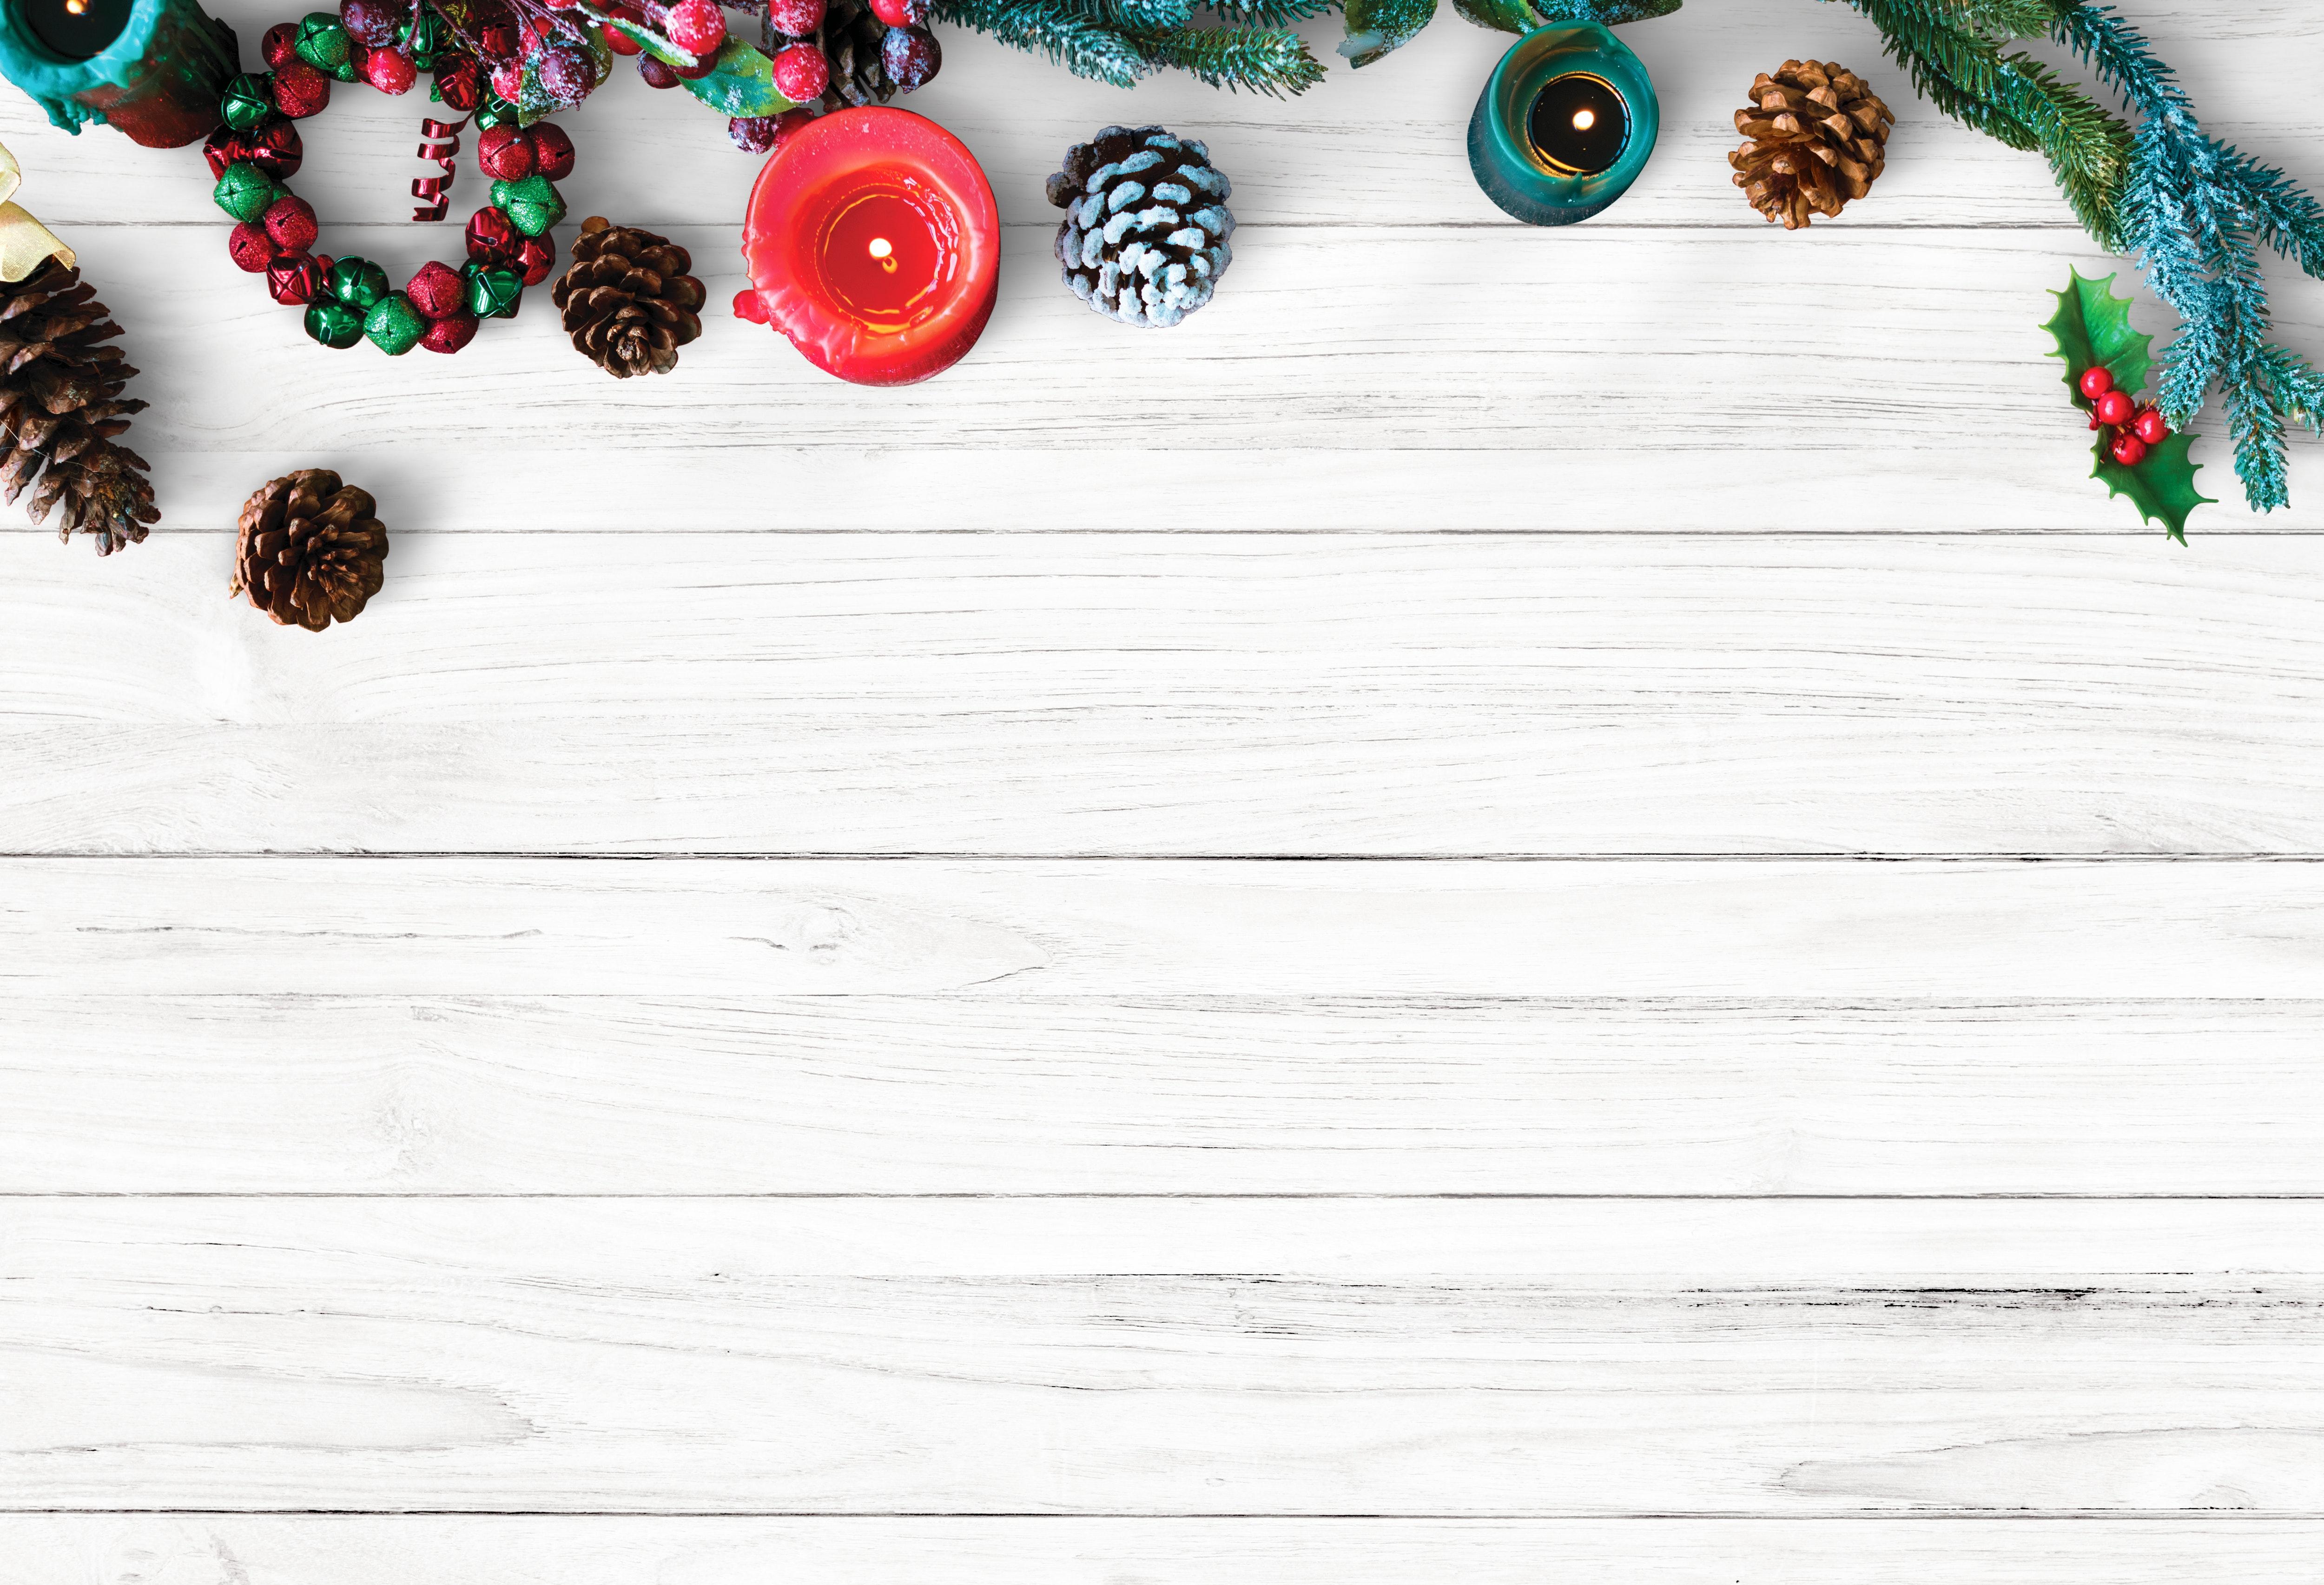 Background quảng cáo Noel đẹp